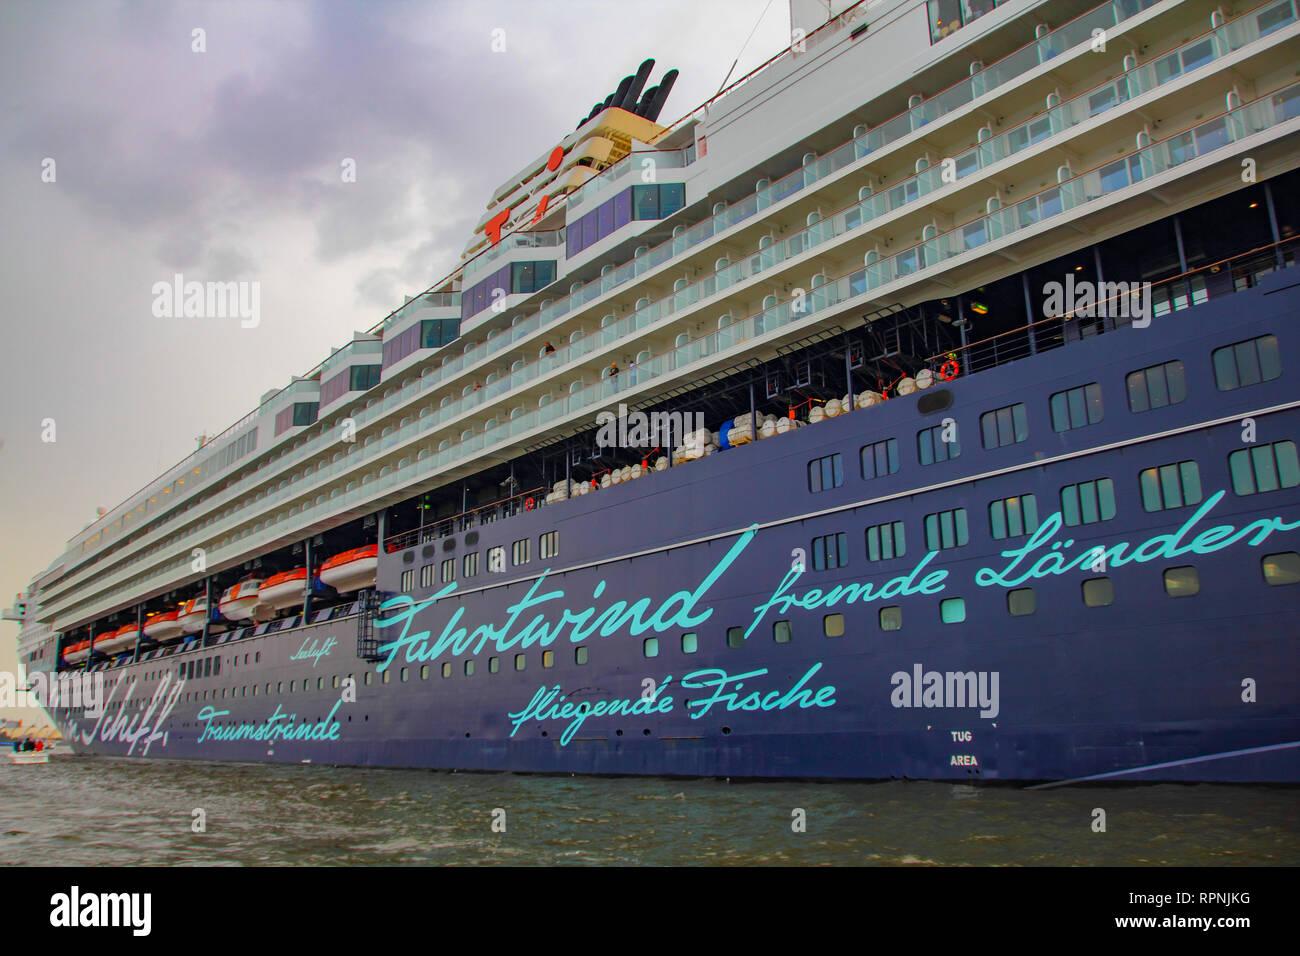 Mein Schiff Valletta cruise ship cabin side view in Hamburg harbor archival 2010 - Stock Image